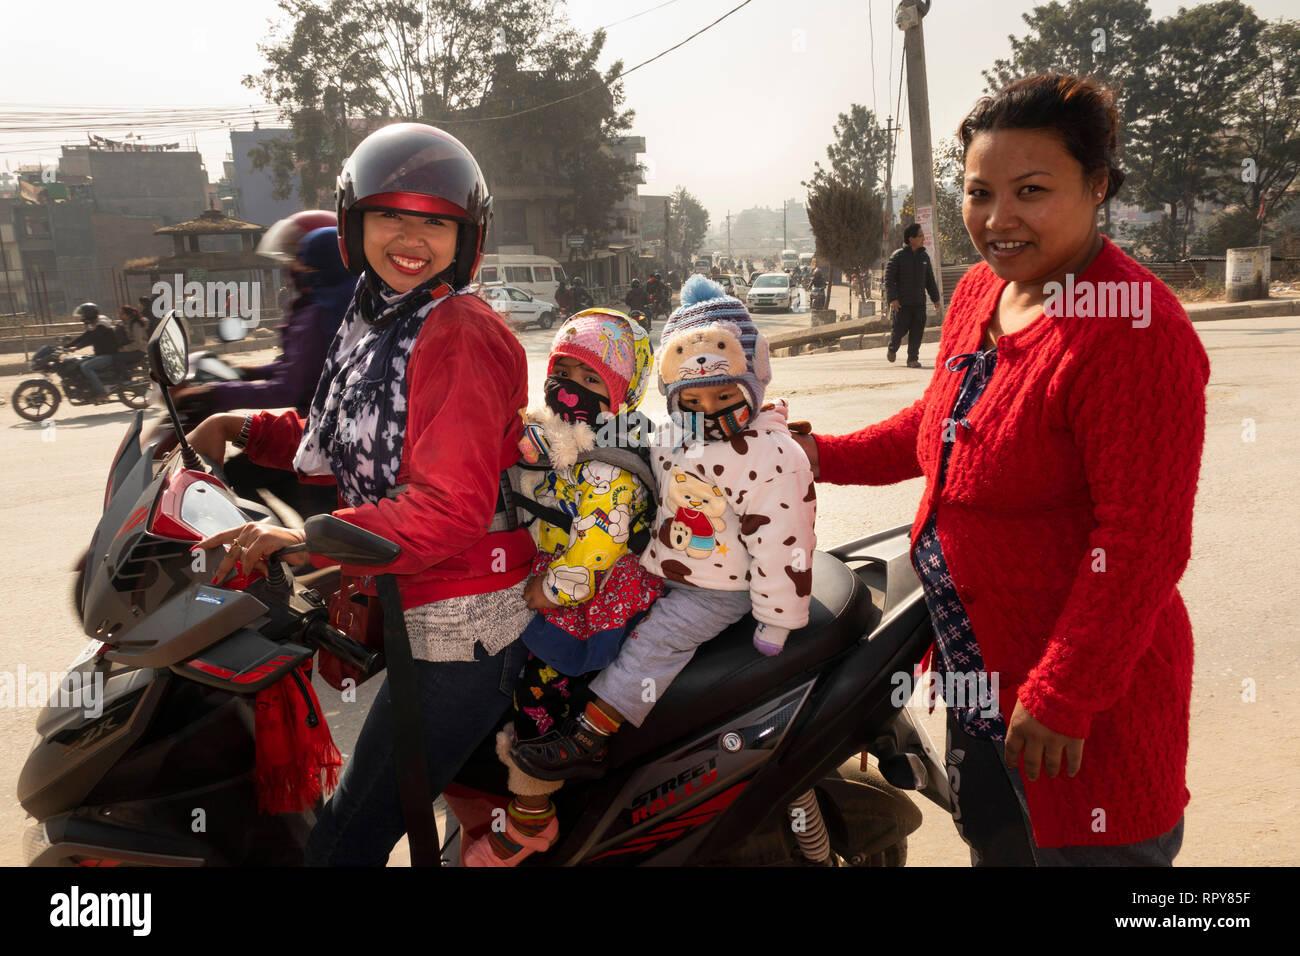 Nepal, Kathmandu, Thamel, Swayambhu Marg, woman carrying two young children on motorbike, outside Indrani and Mahadev temples - Stock Image